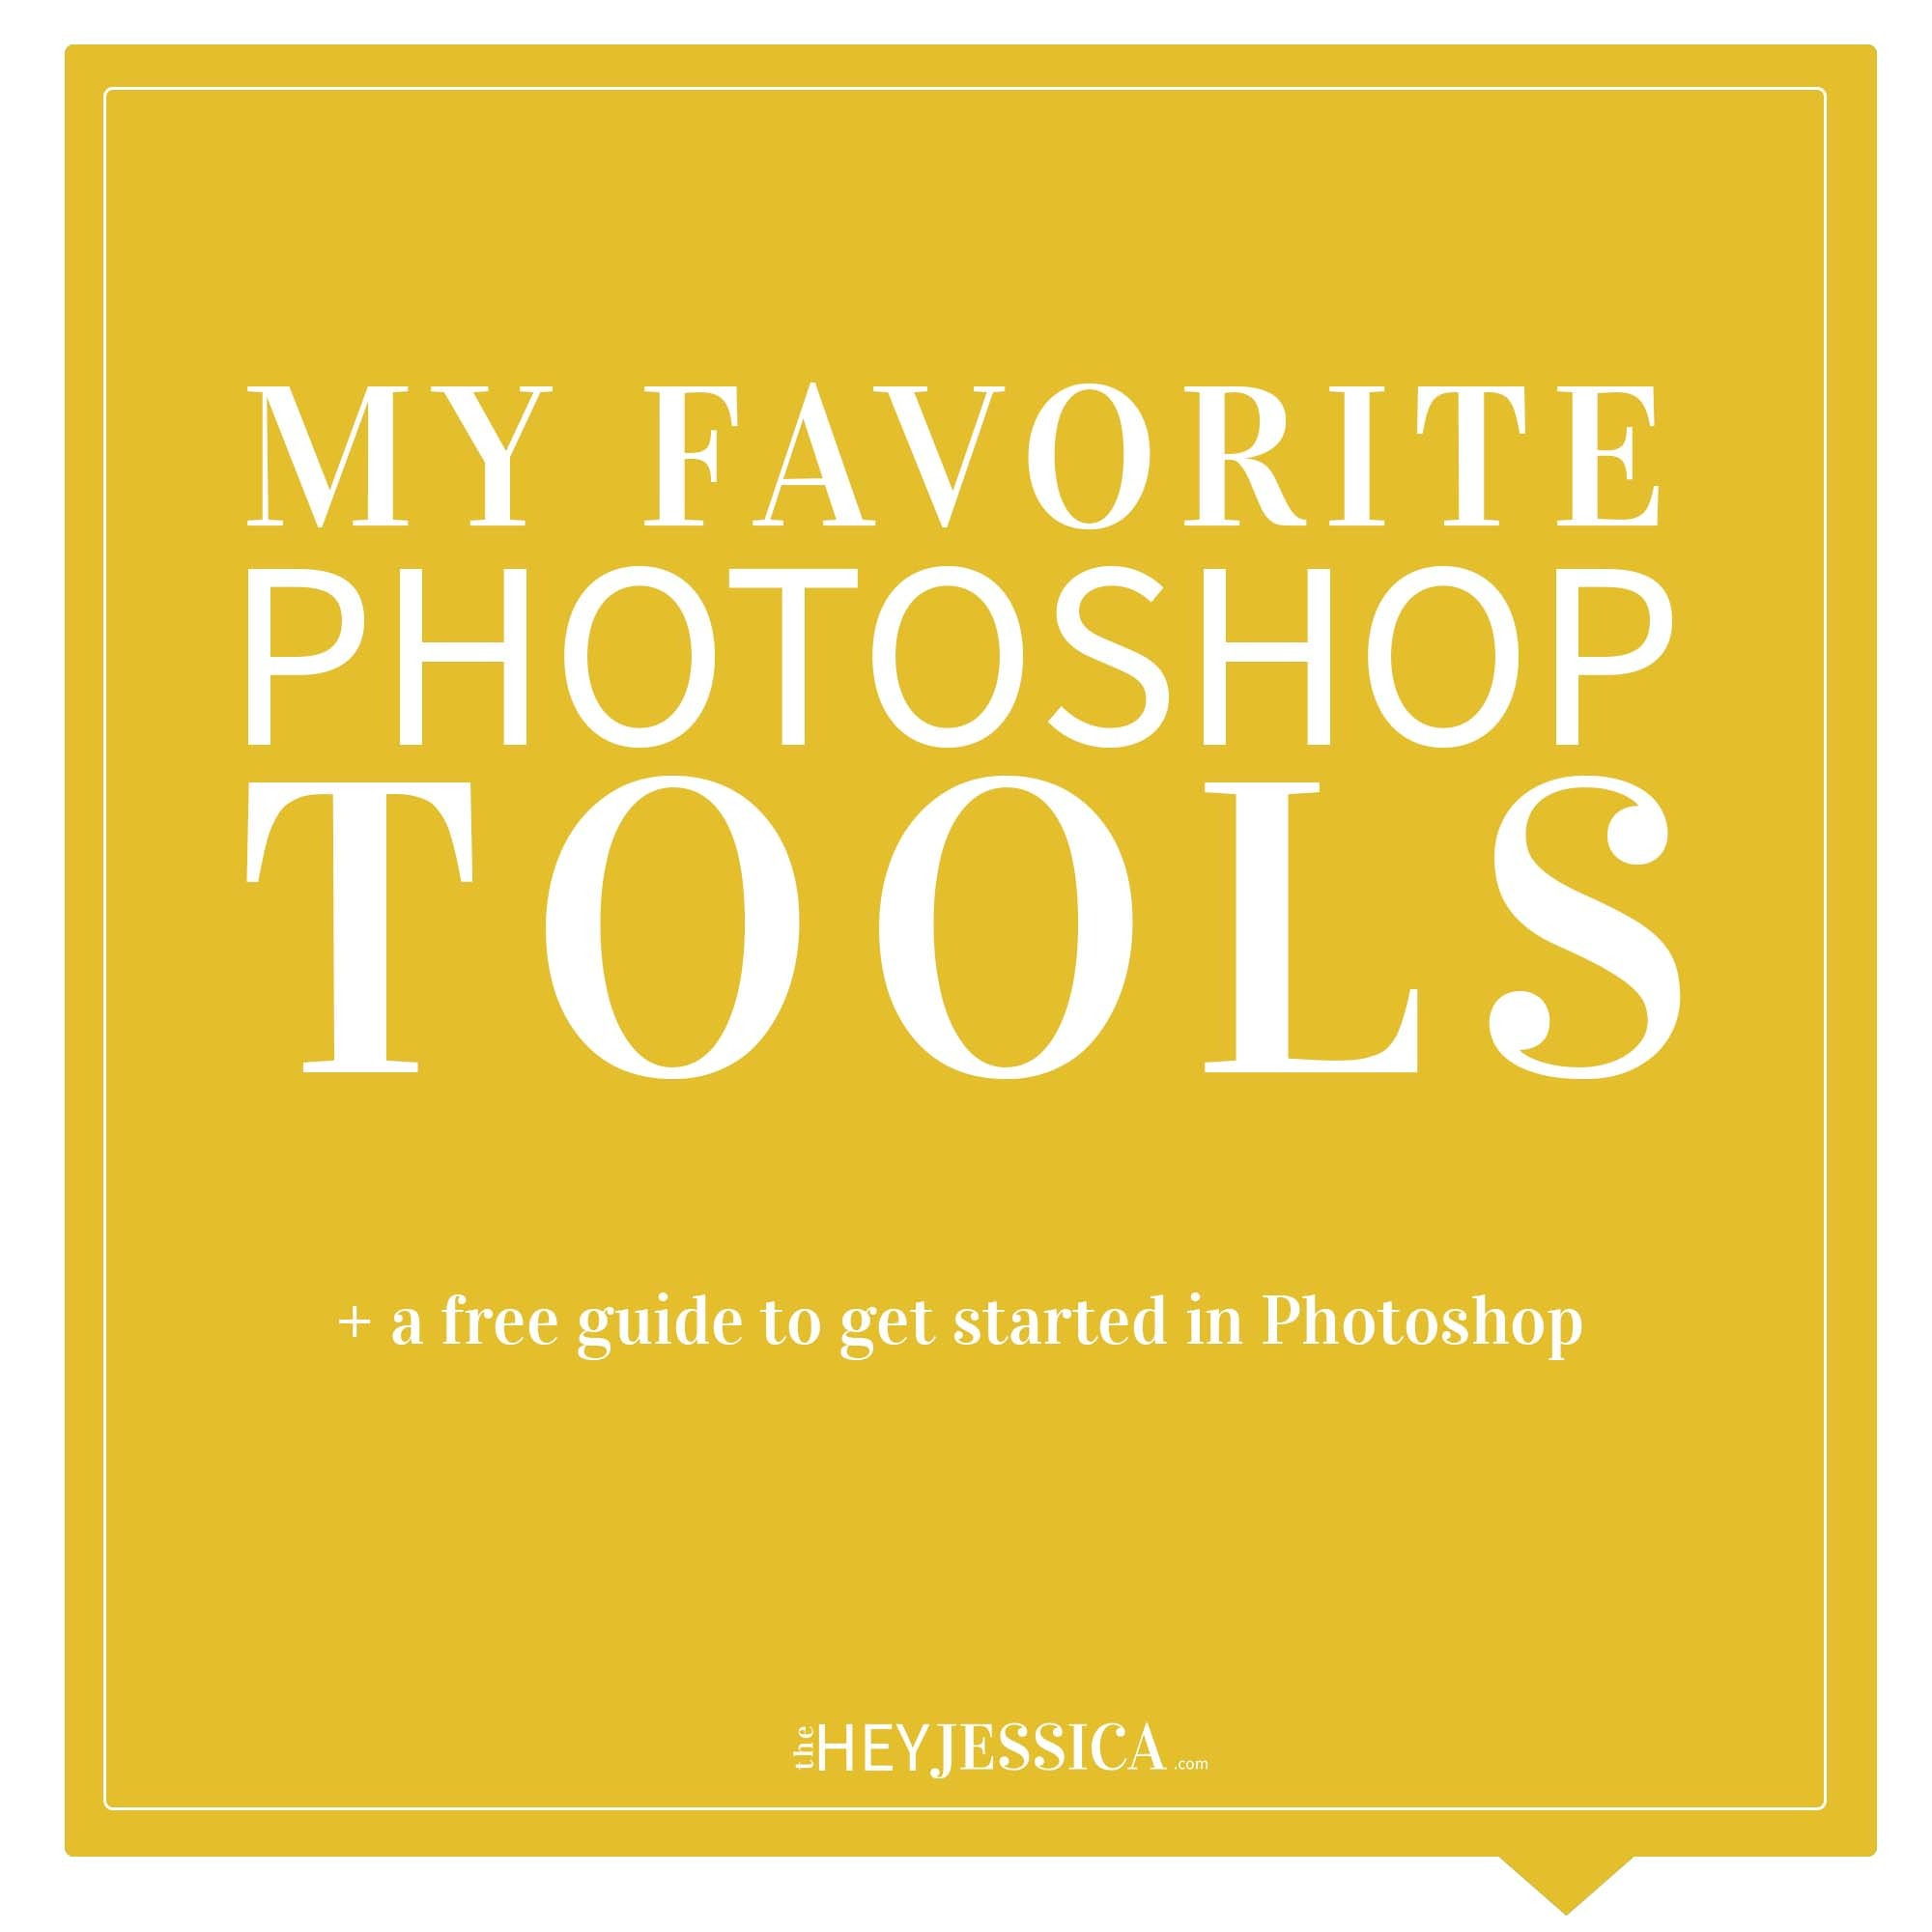 My Favorite Photoshop Tools